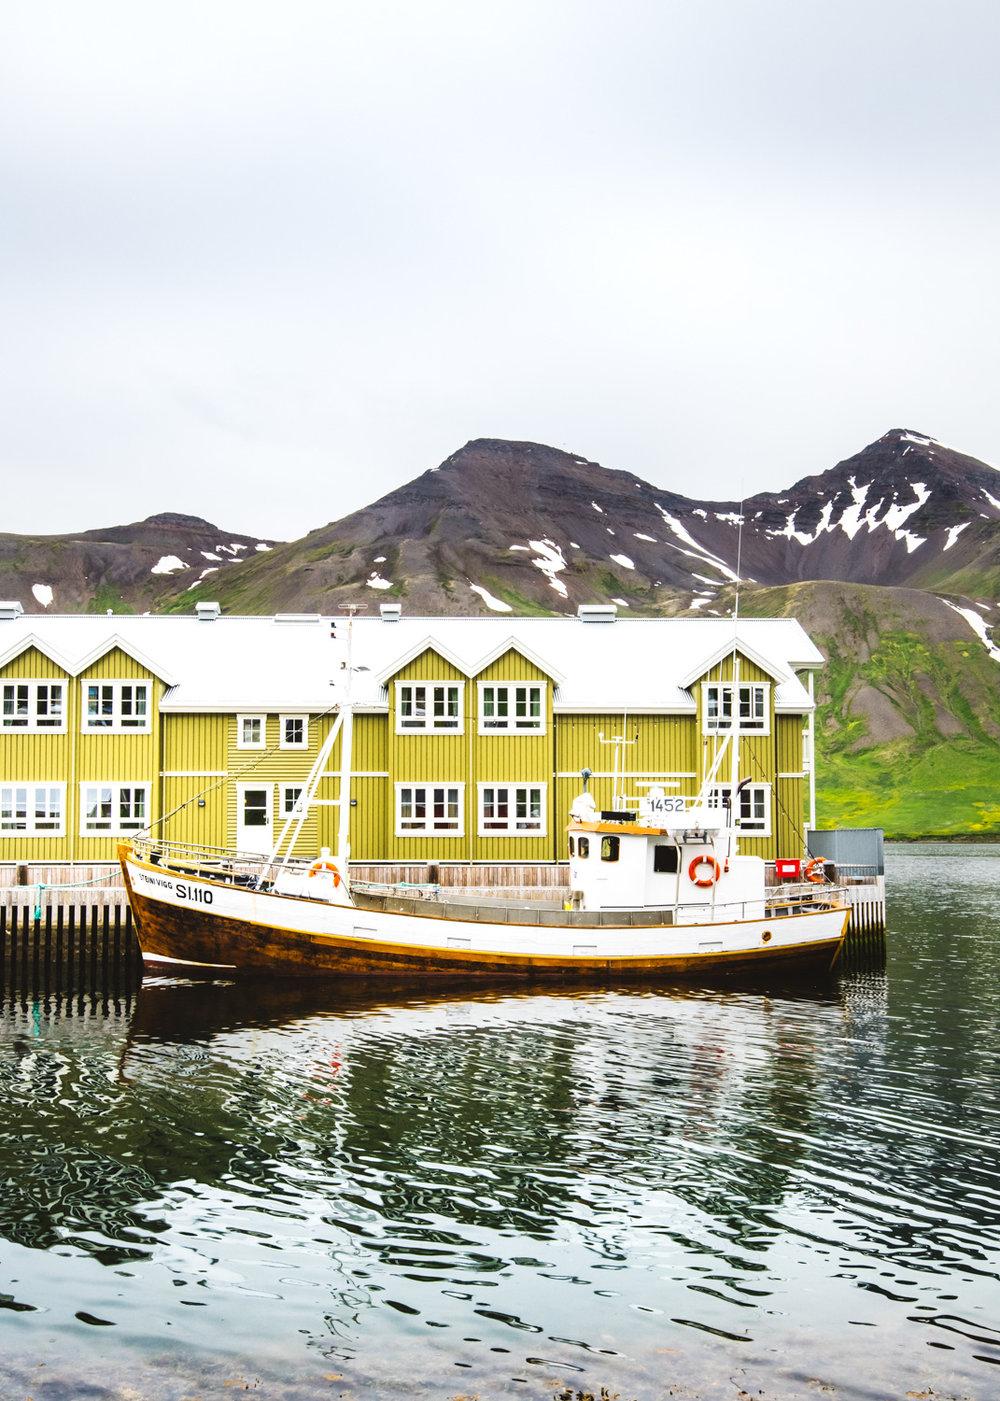 North-Iceland_3_c Nanna Dis 2018 (1 of 1).jpg